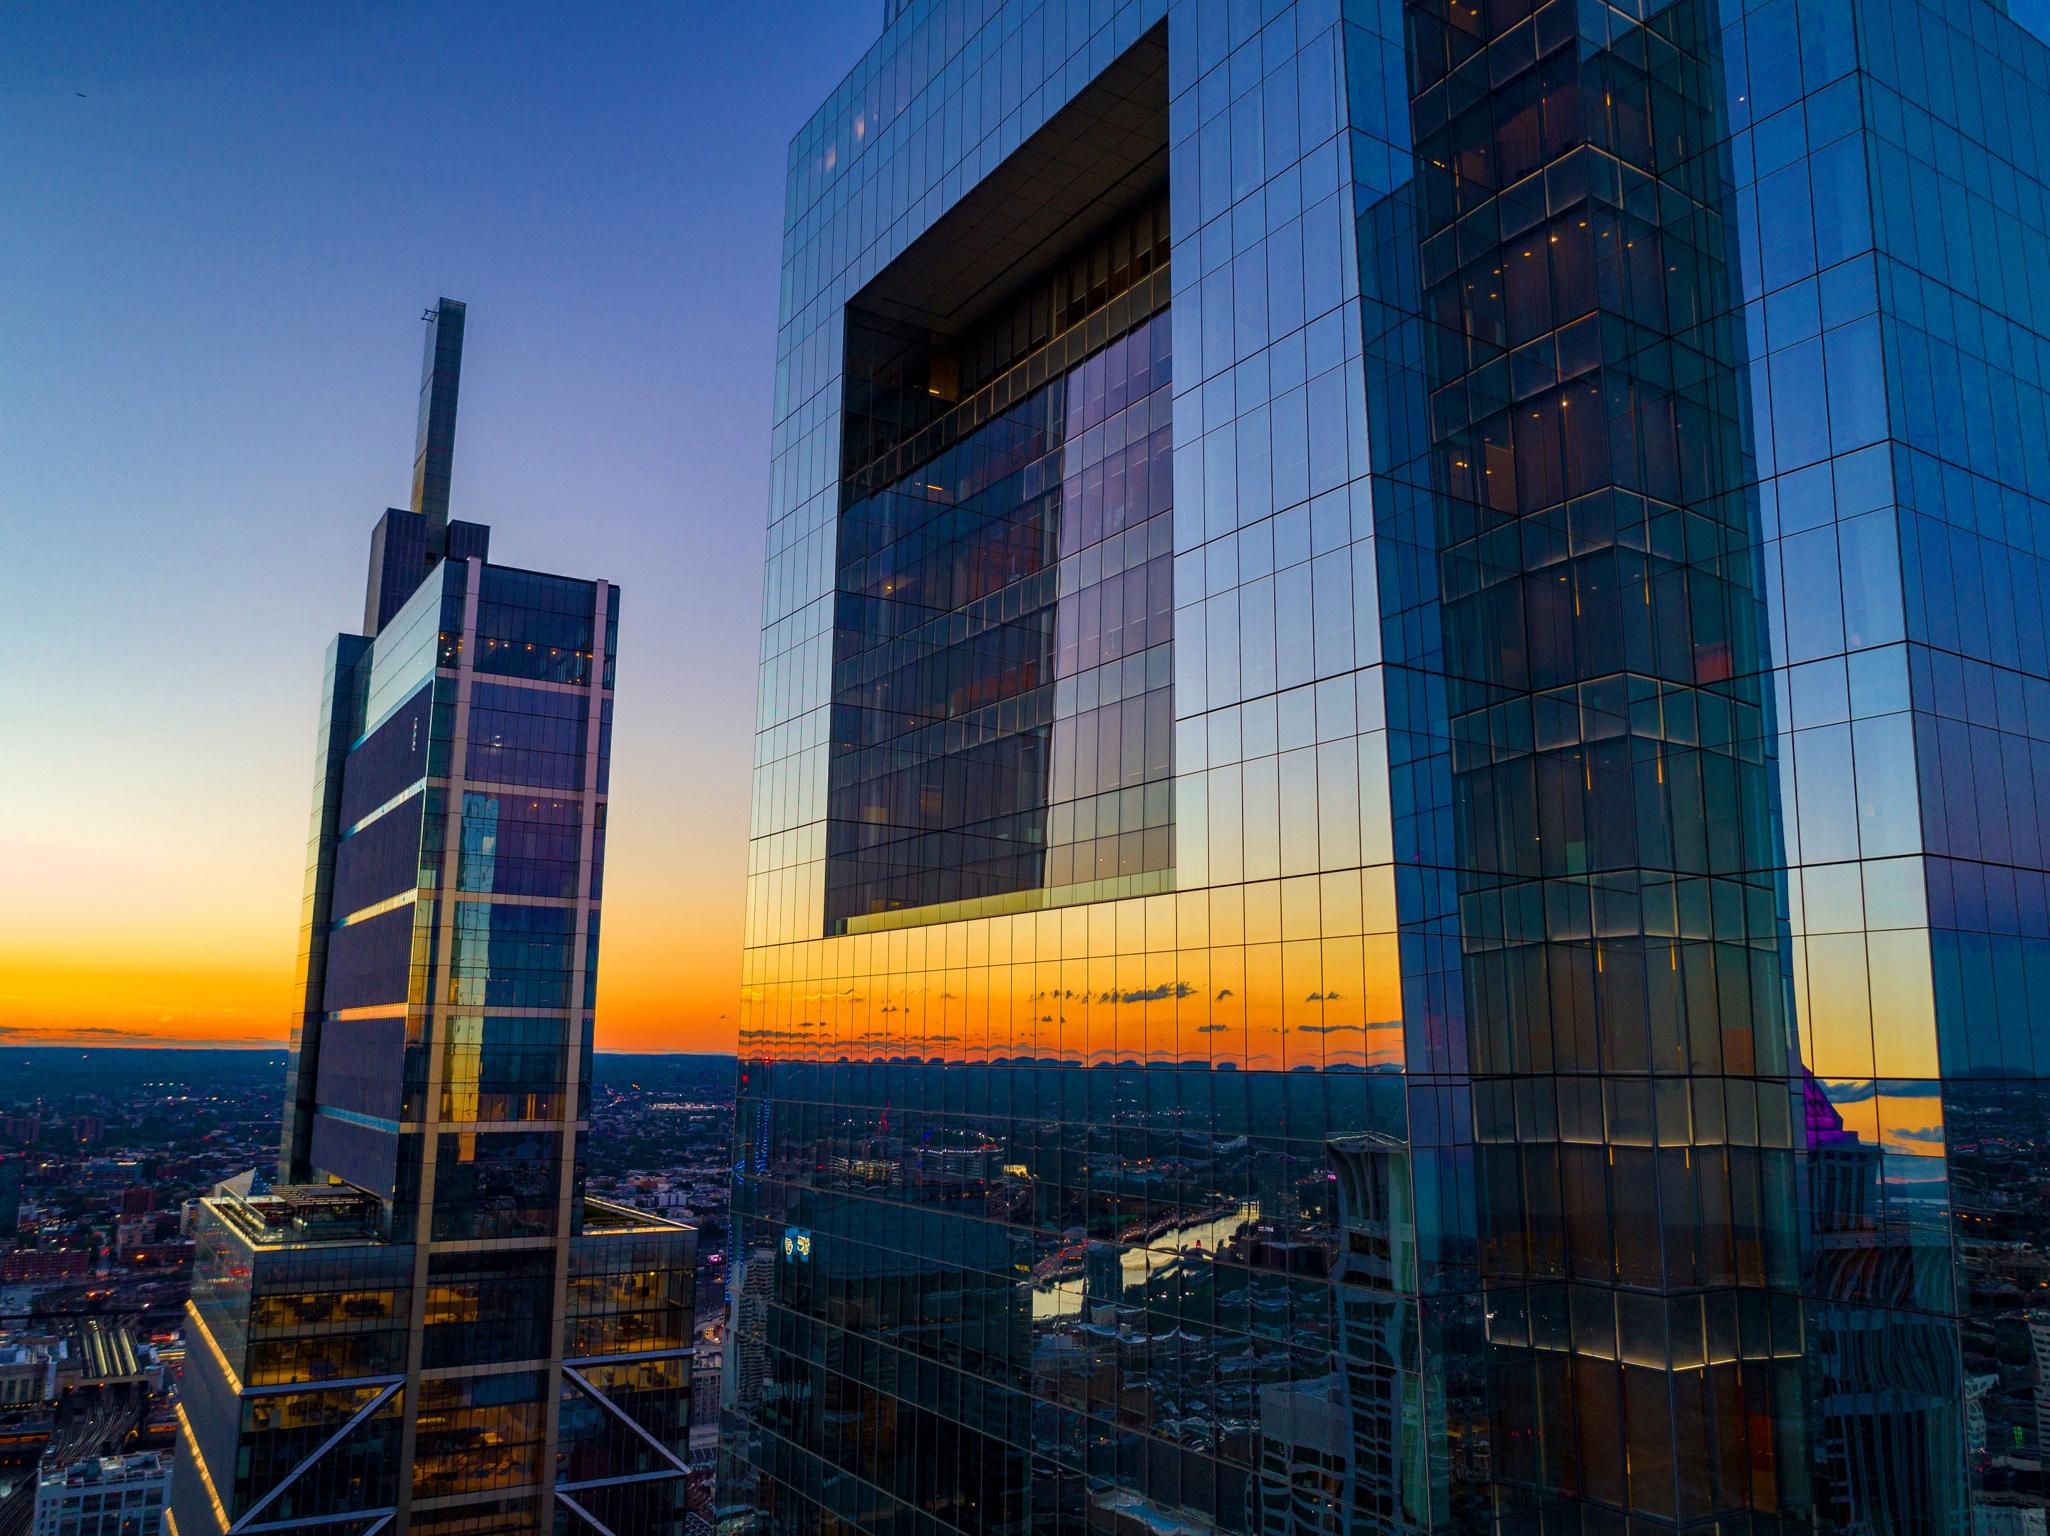 Chris Dantonio_Drone Photo Close Up of Comcast Buildings with Sun Reflection.JPG